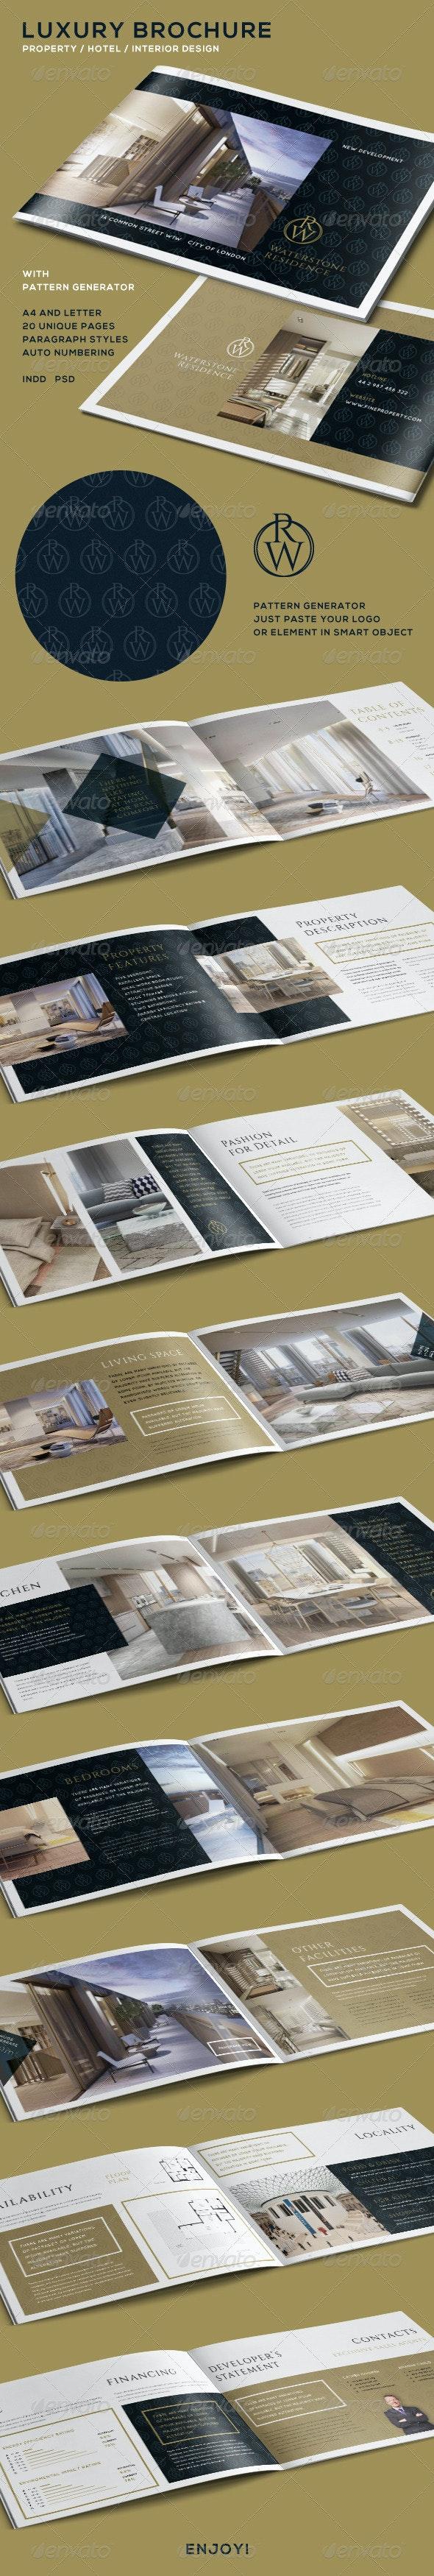 Luxury Brochure for Property - Hotel - Interior - Catalogs Brochures